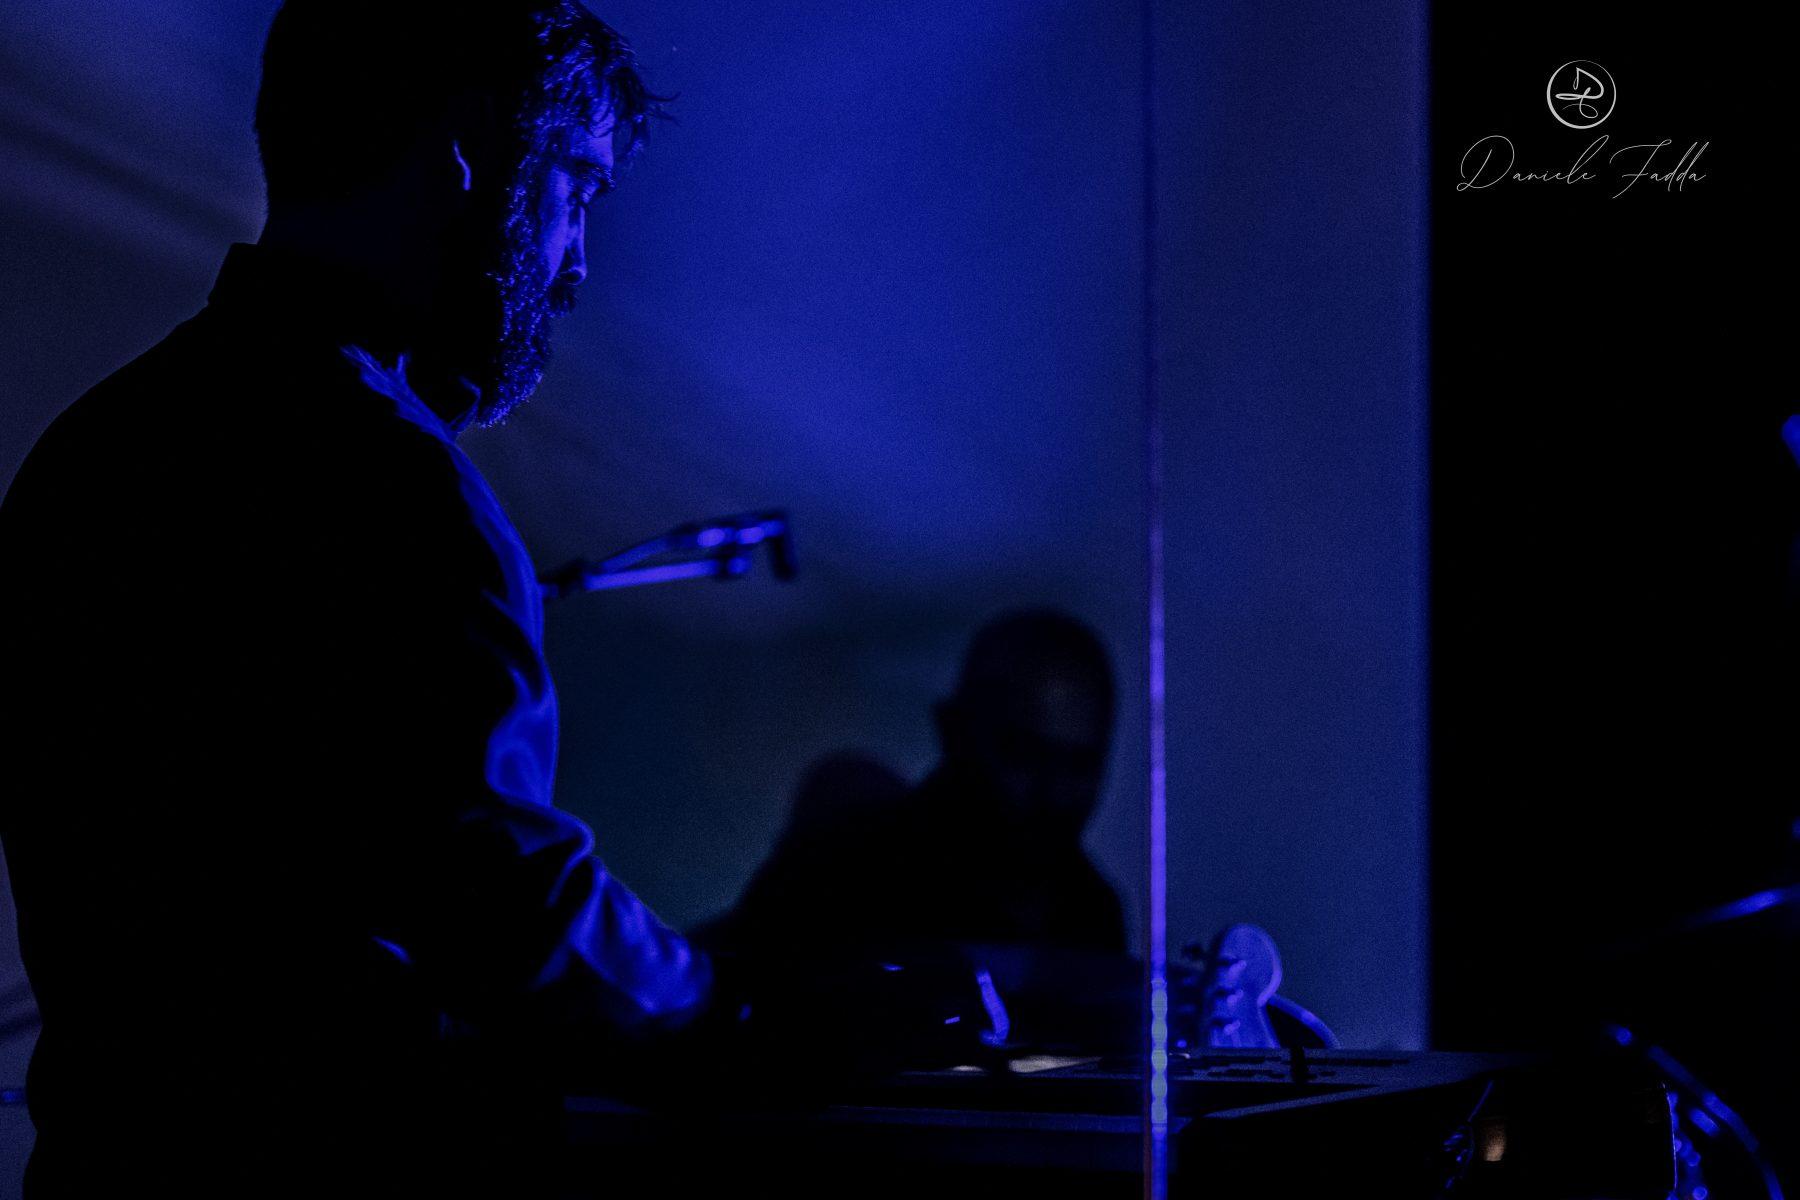 kme - live report - luigi frassetto quartet - daniele fadda - sa scena sarda - 2019 - karel music expo